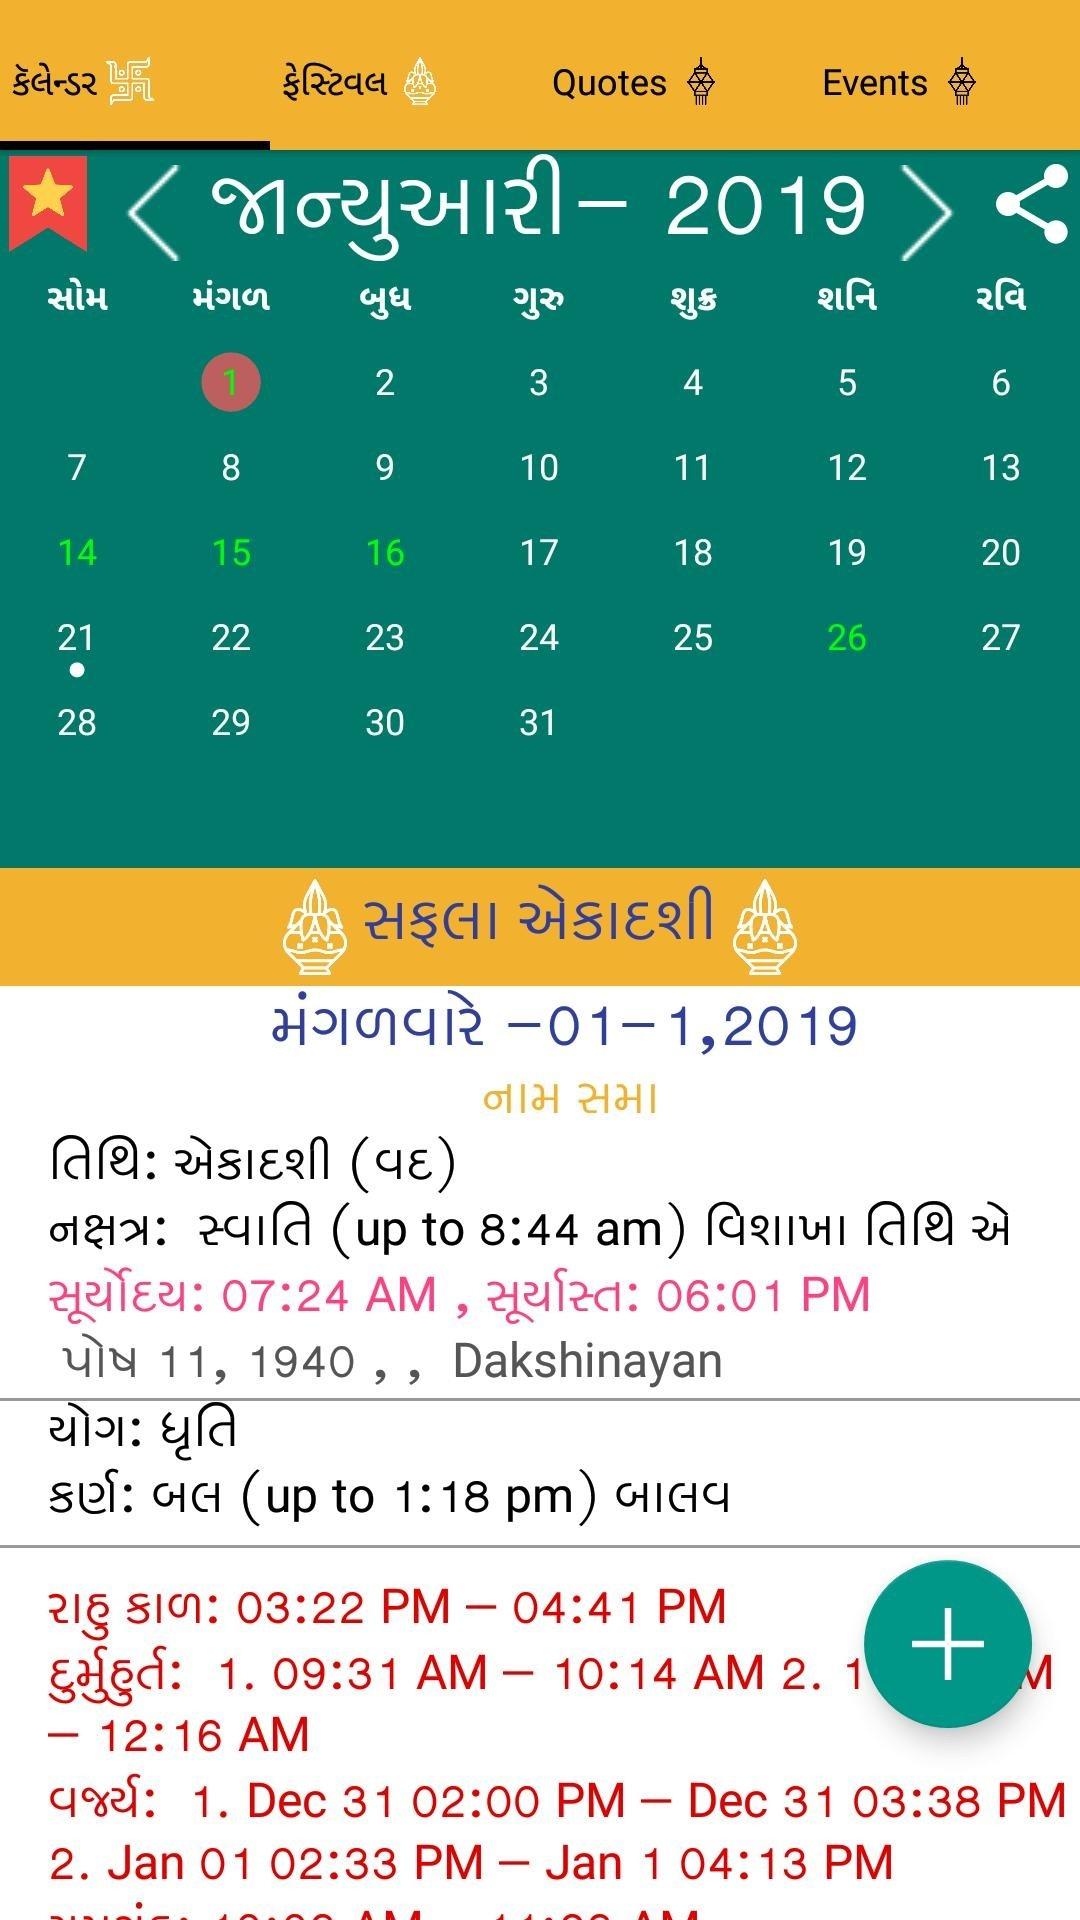 Gujarati Calendar 2019 For Android - Apk Download-Gujarati Calendar 2020 January To December